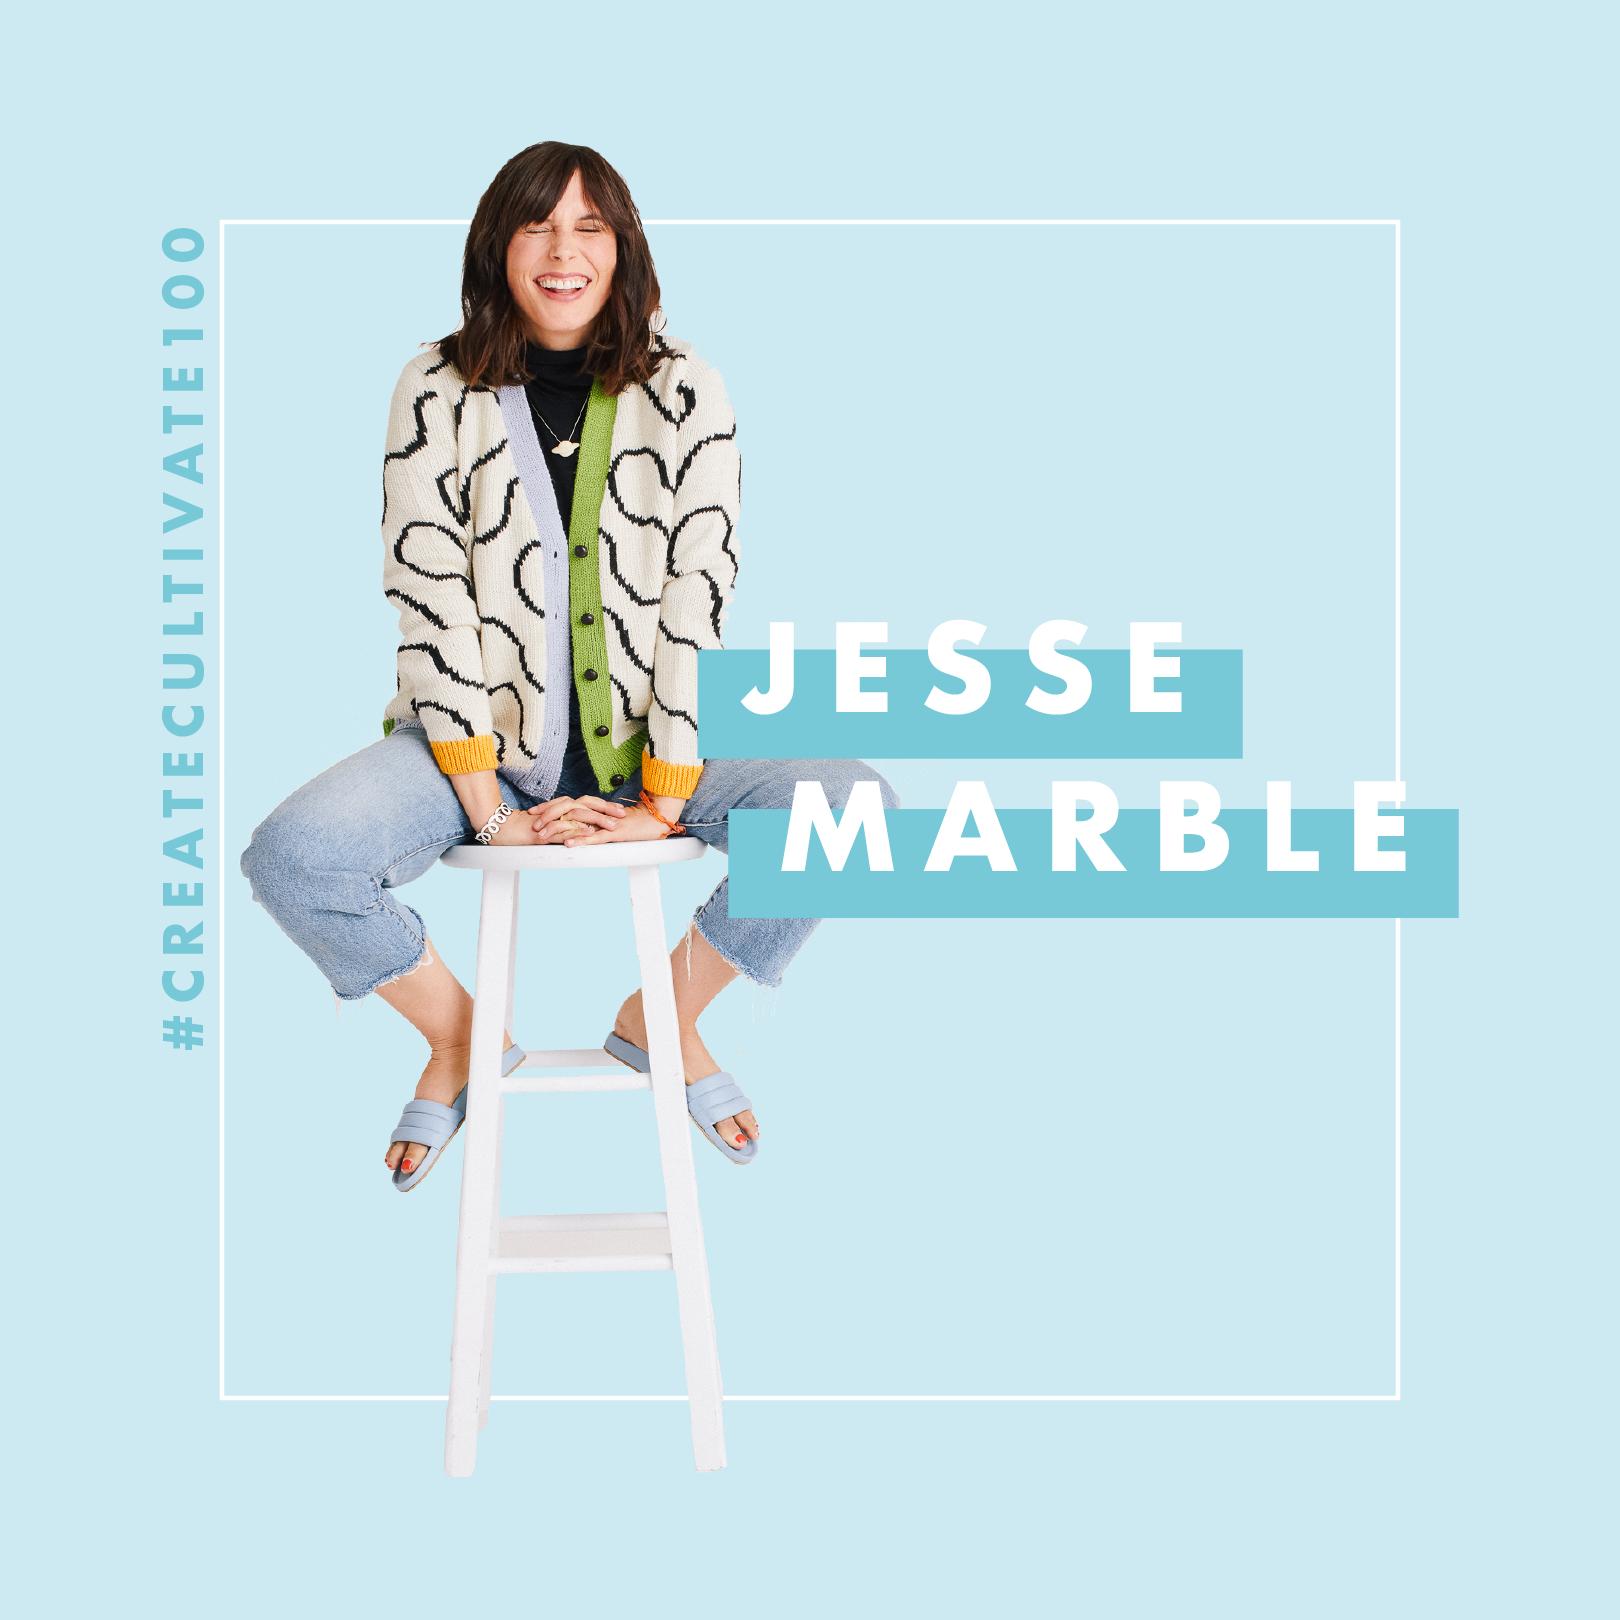 Jesse_square.png